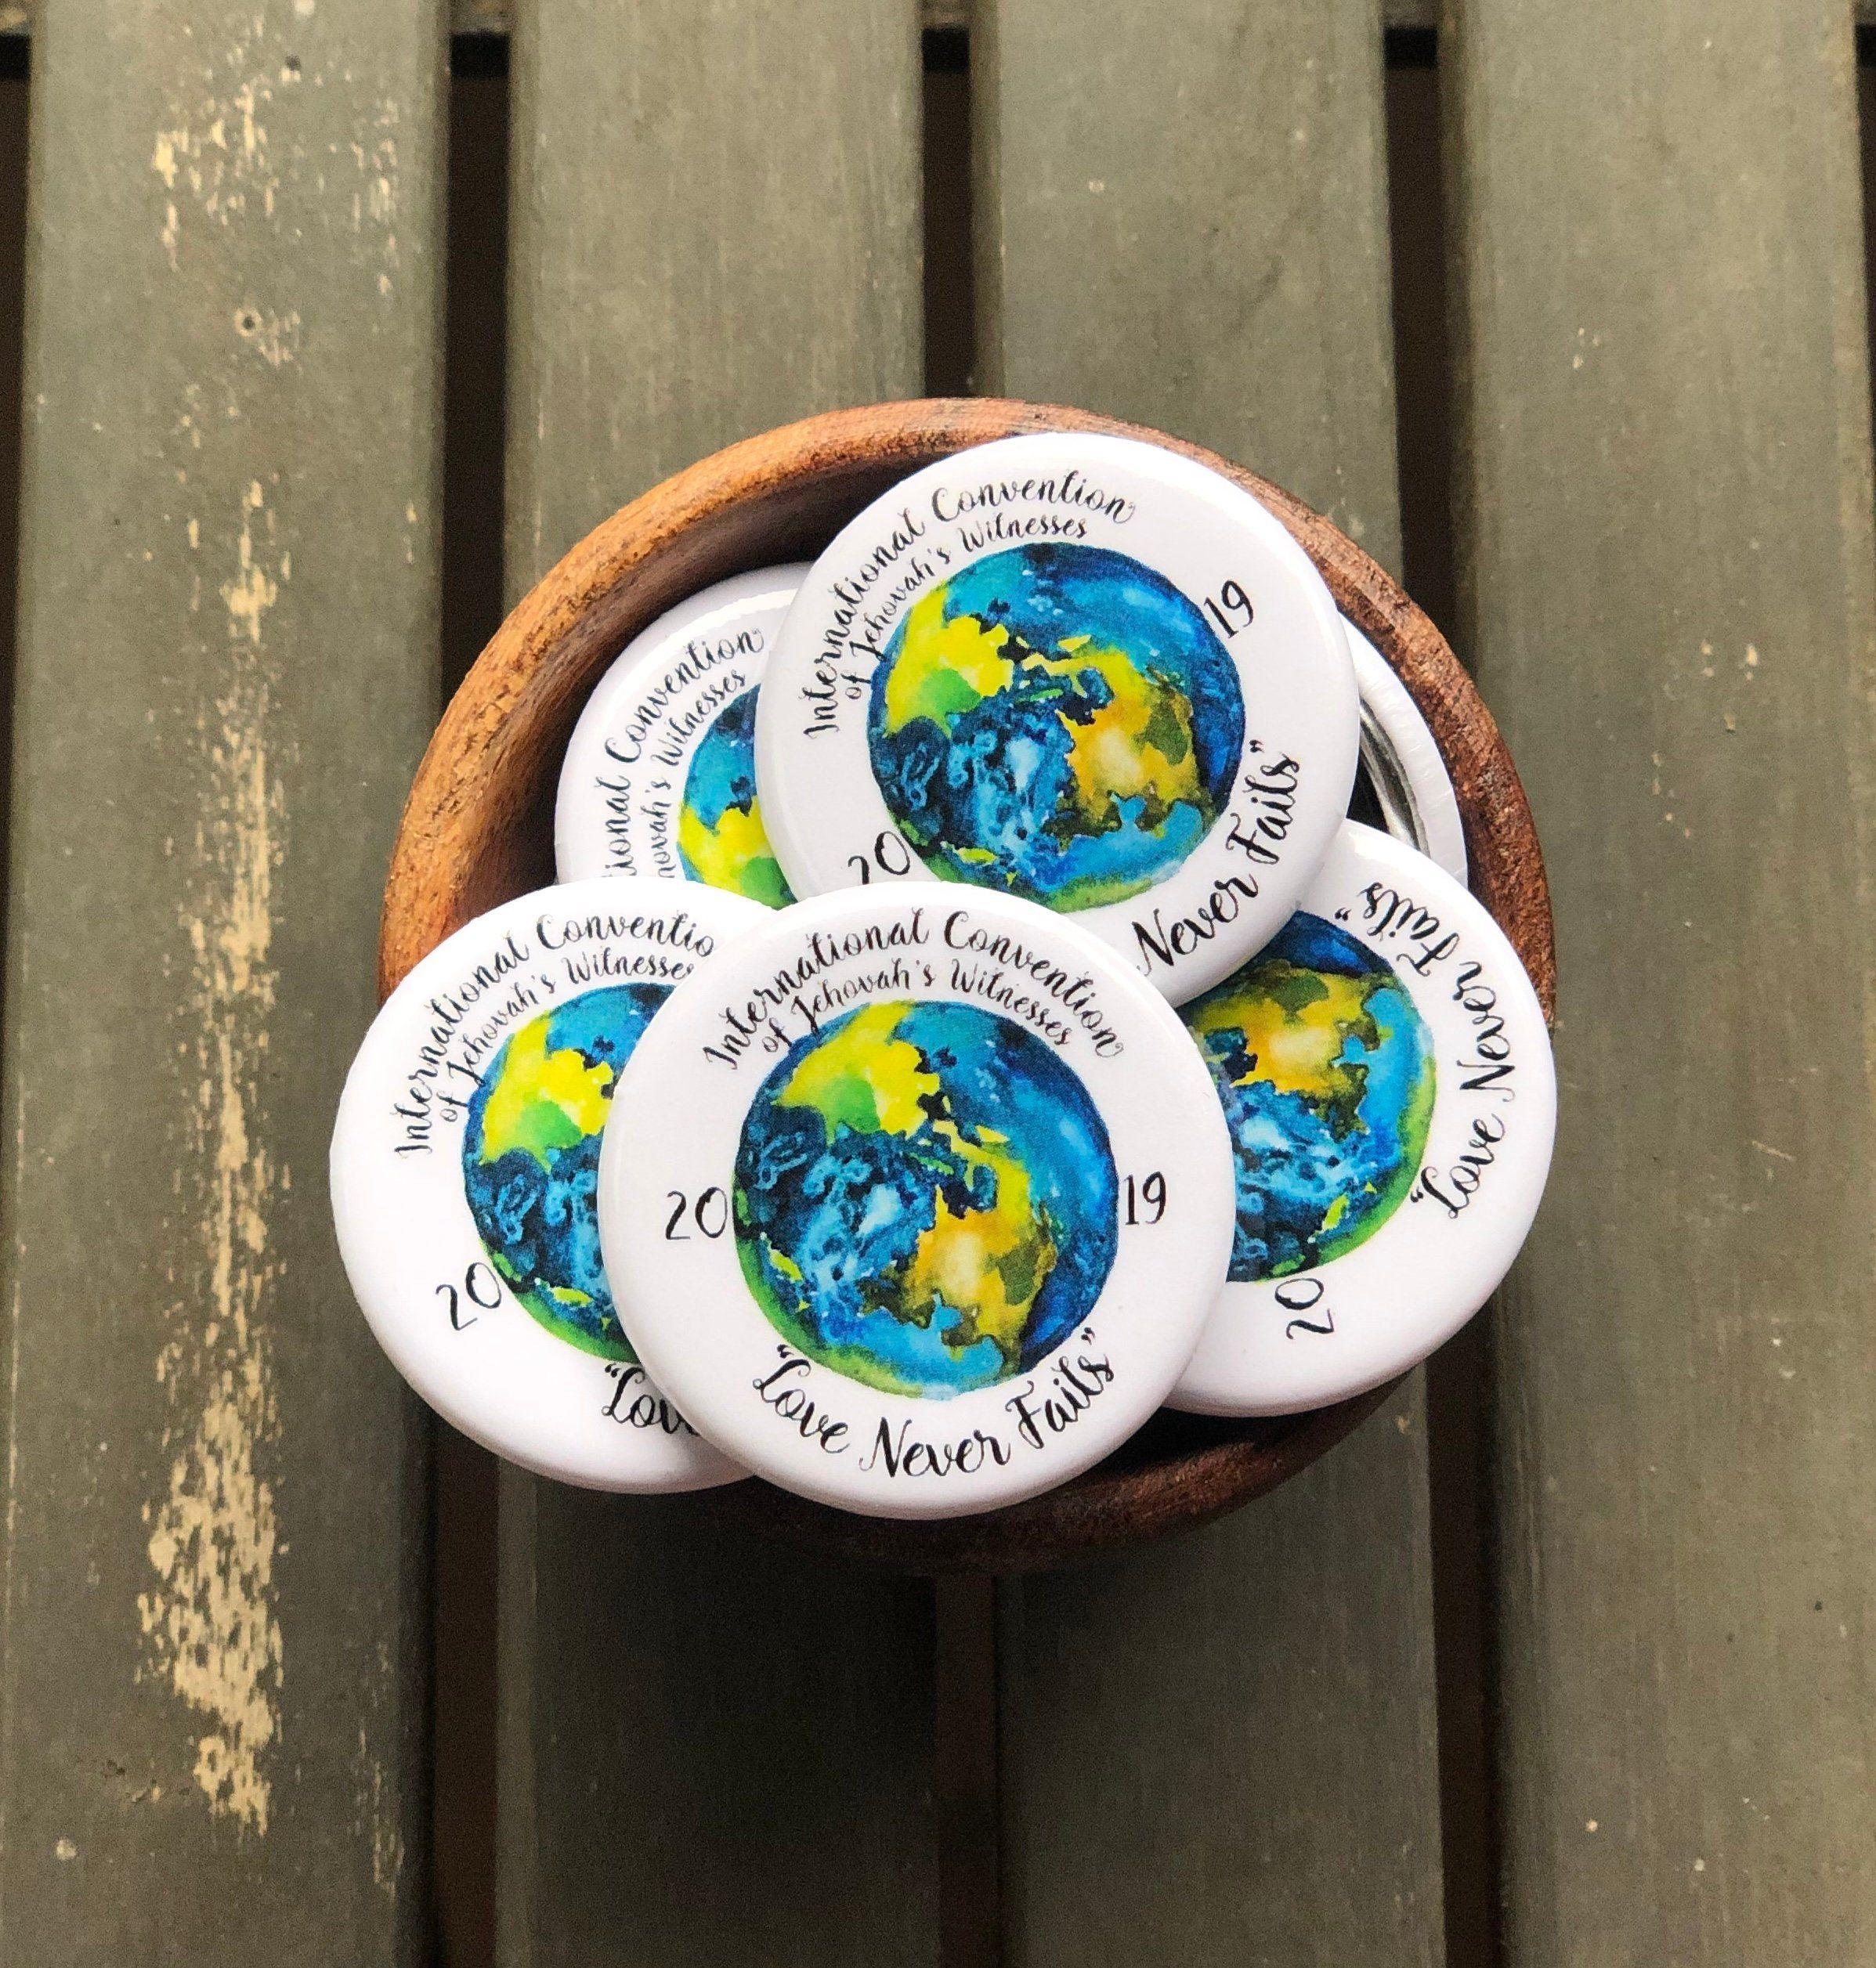 JW 2019 International Convention Button Pin - 1 25 inch